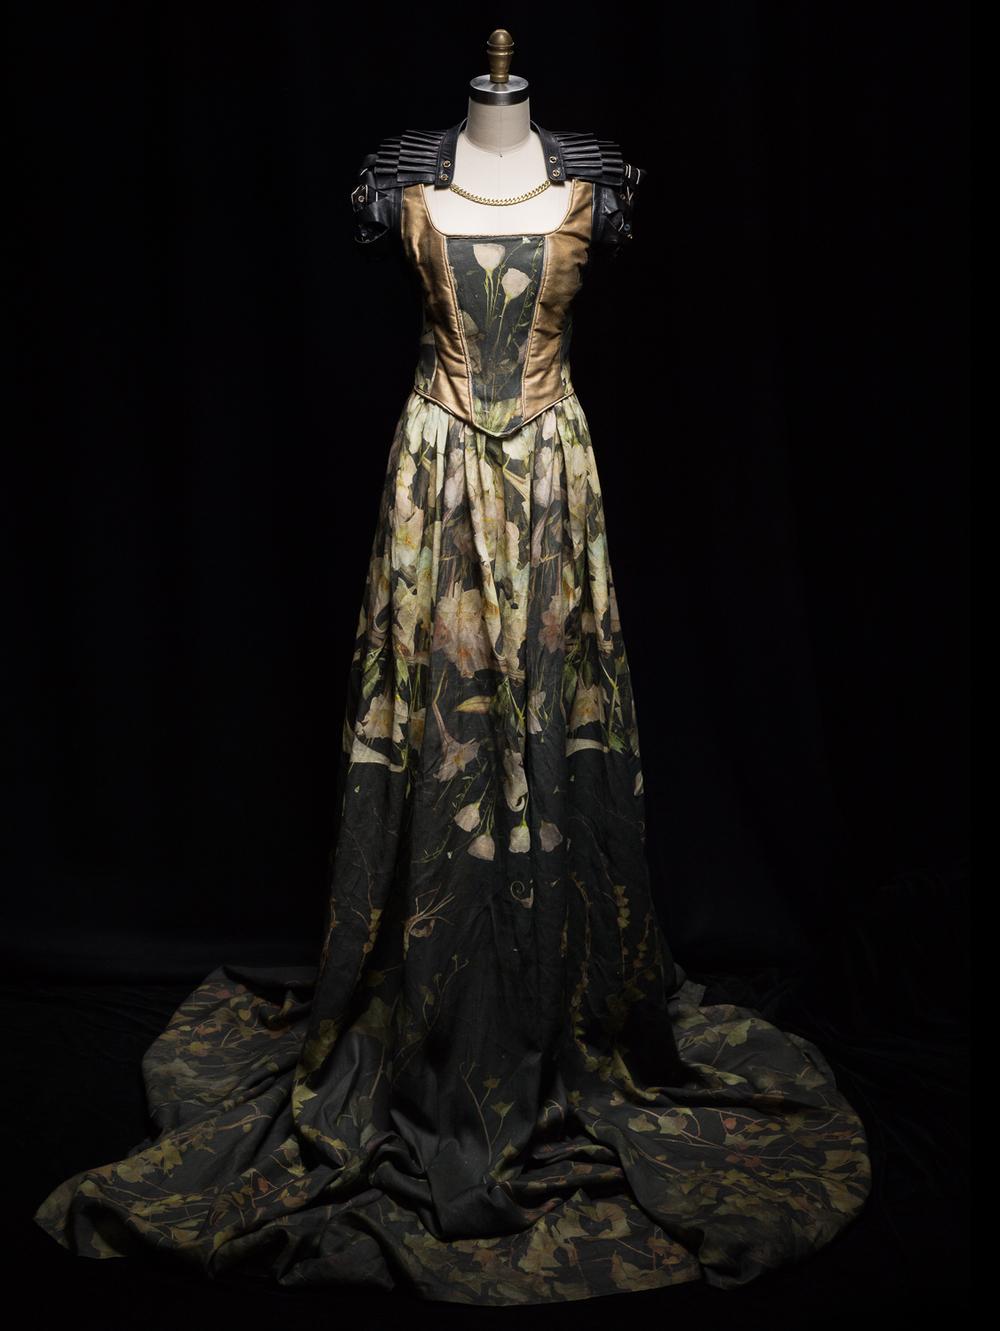 The Gown, Print on Belgium Linen